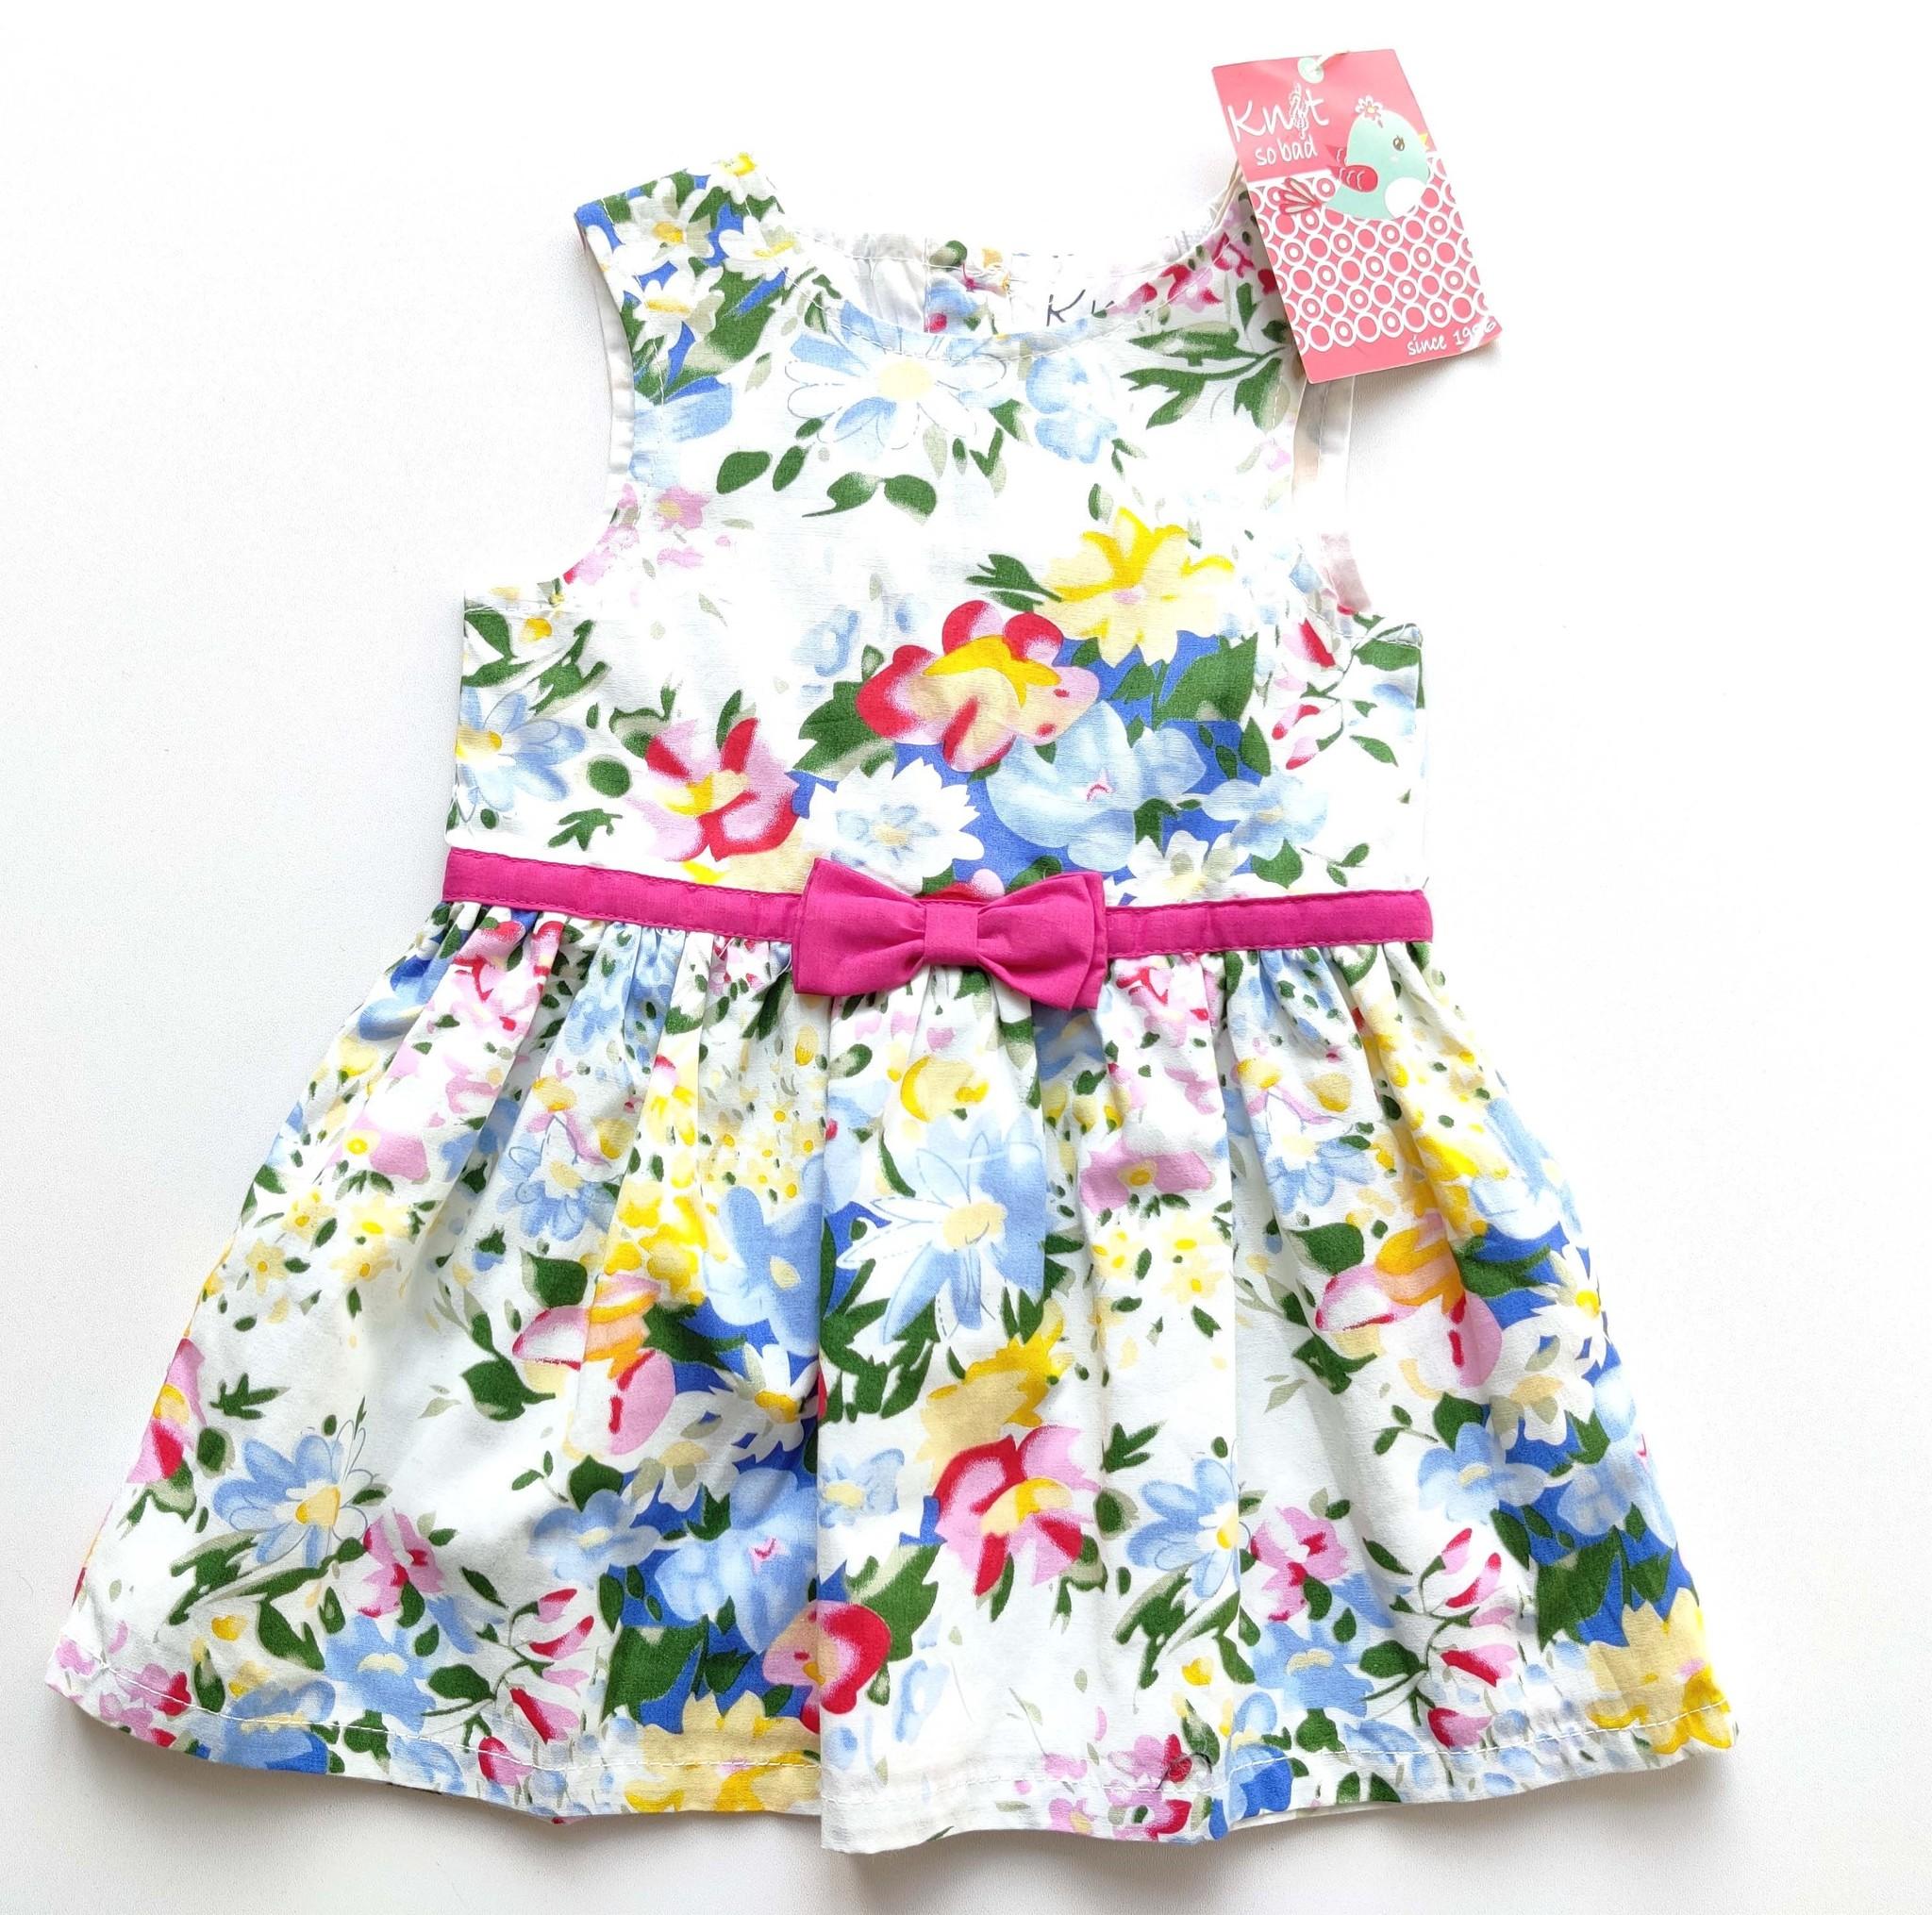 Nieuwe jurk Knot so bad-1